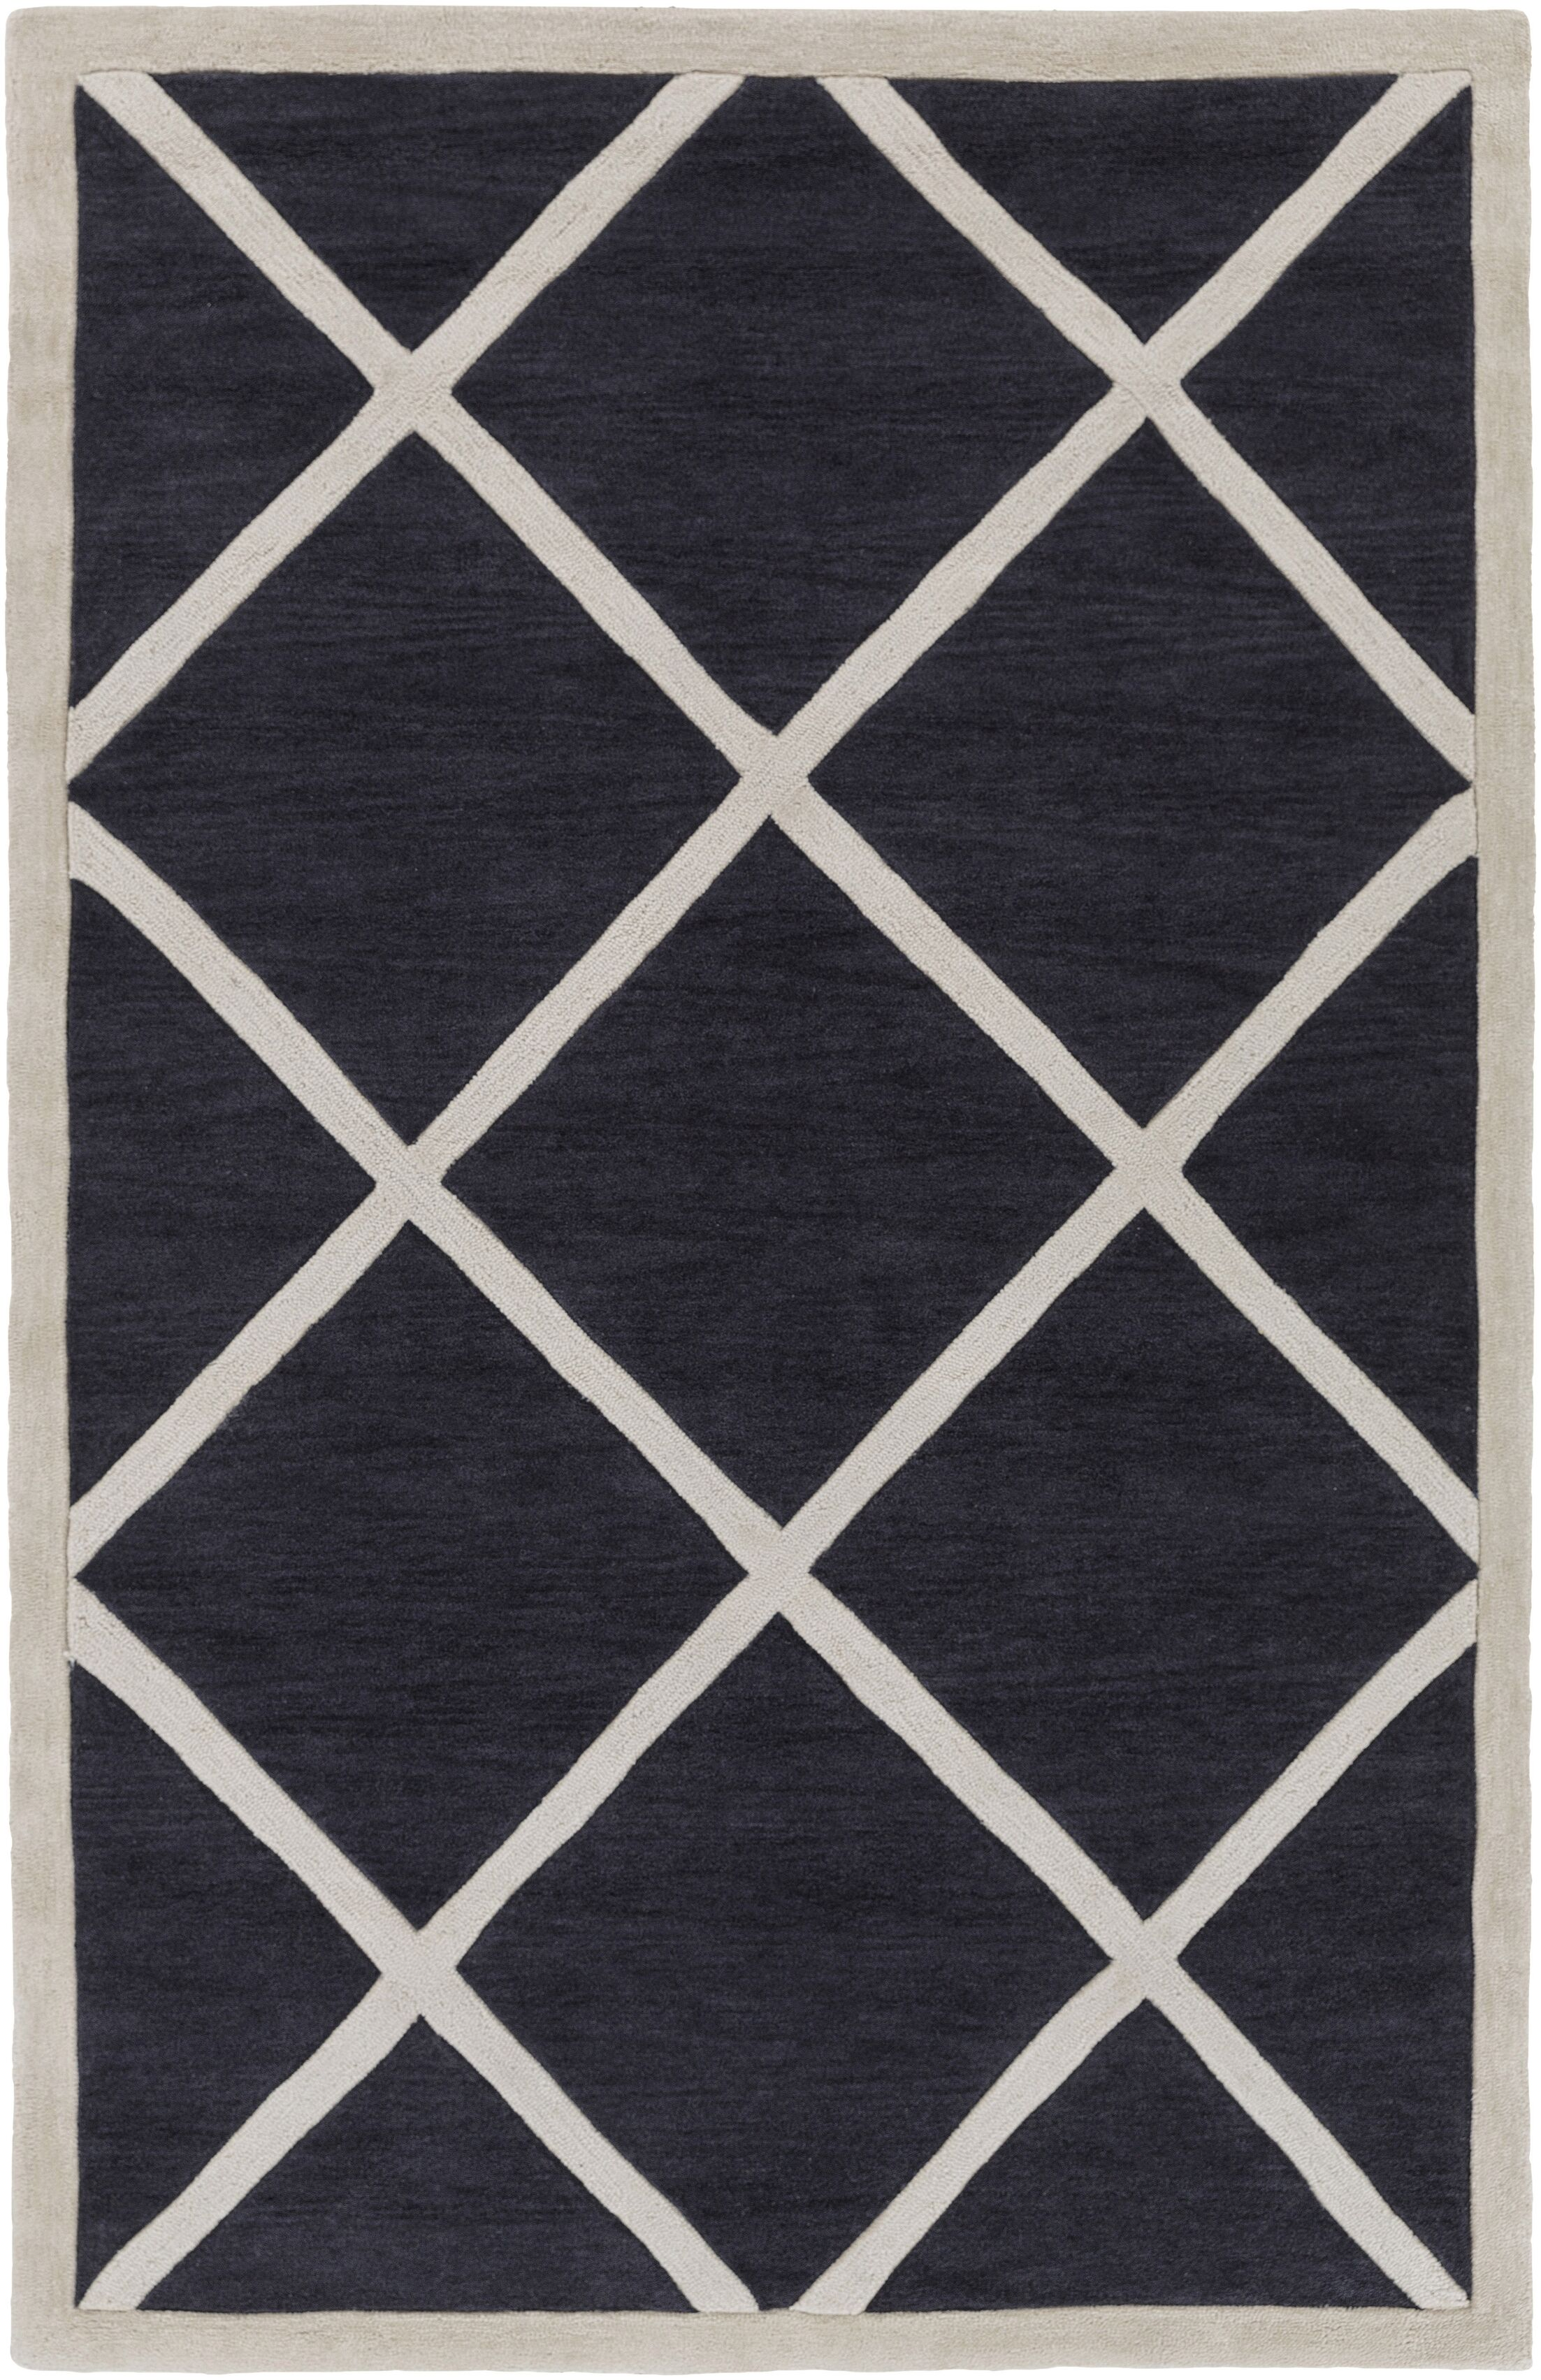 Cleitus Slate & Ivory Area Rug Rug Size: Rectangle 5' x 7'6